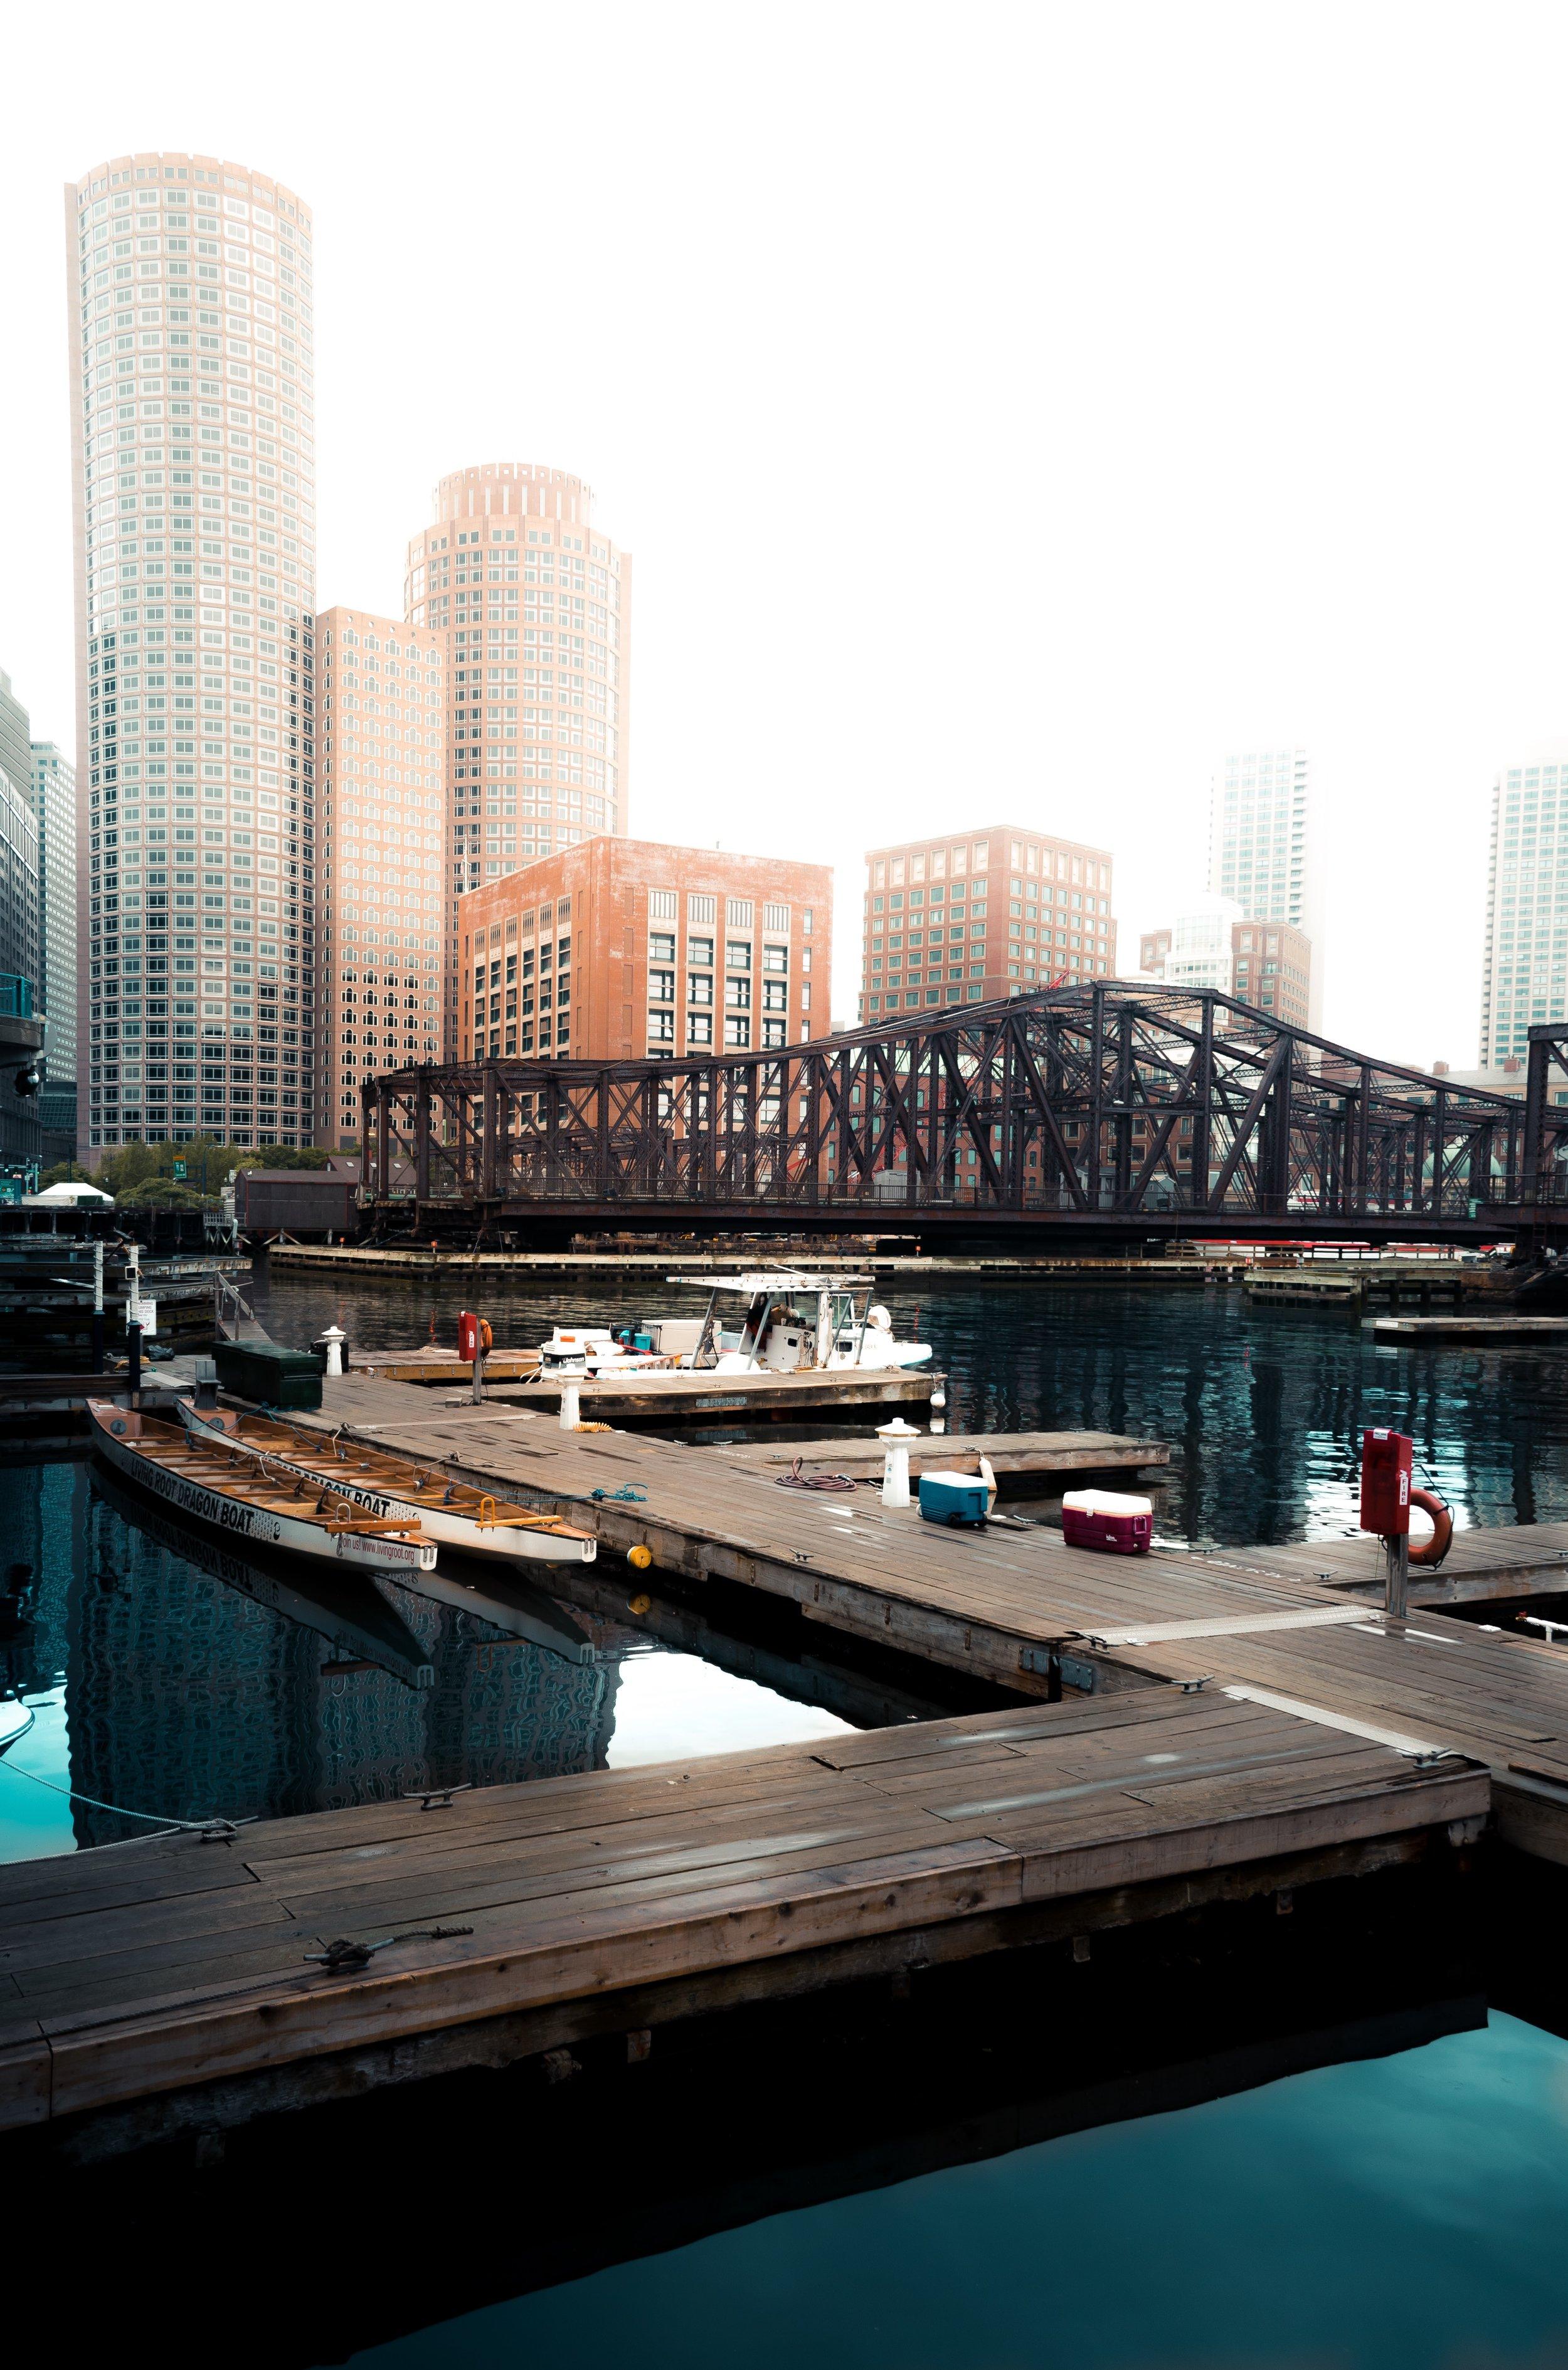 @daverey79 - Fort Pier, Boston, MA